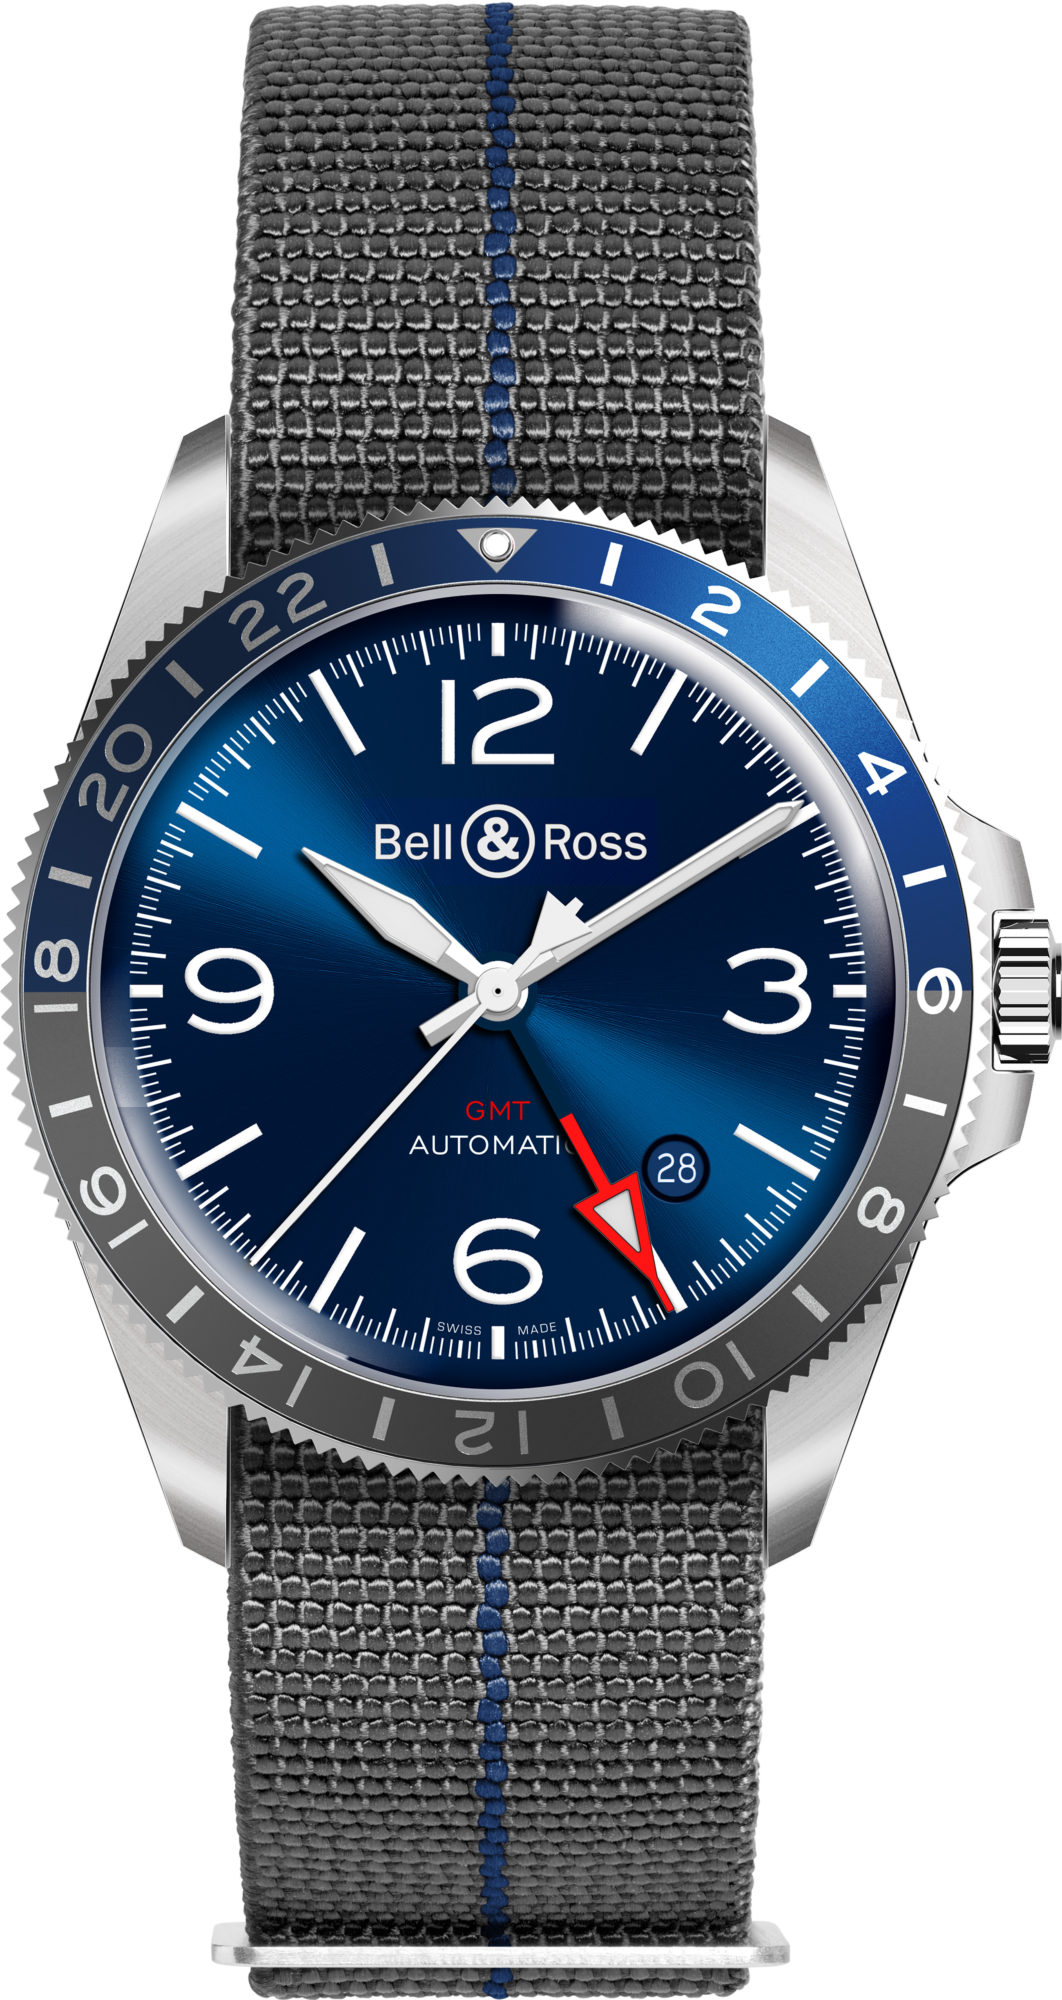 BRV2 de Bell&Ross